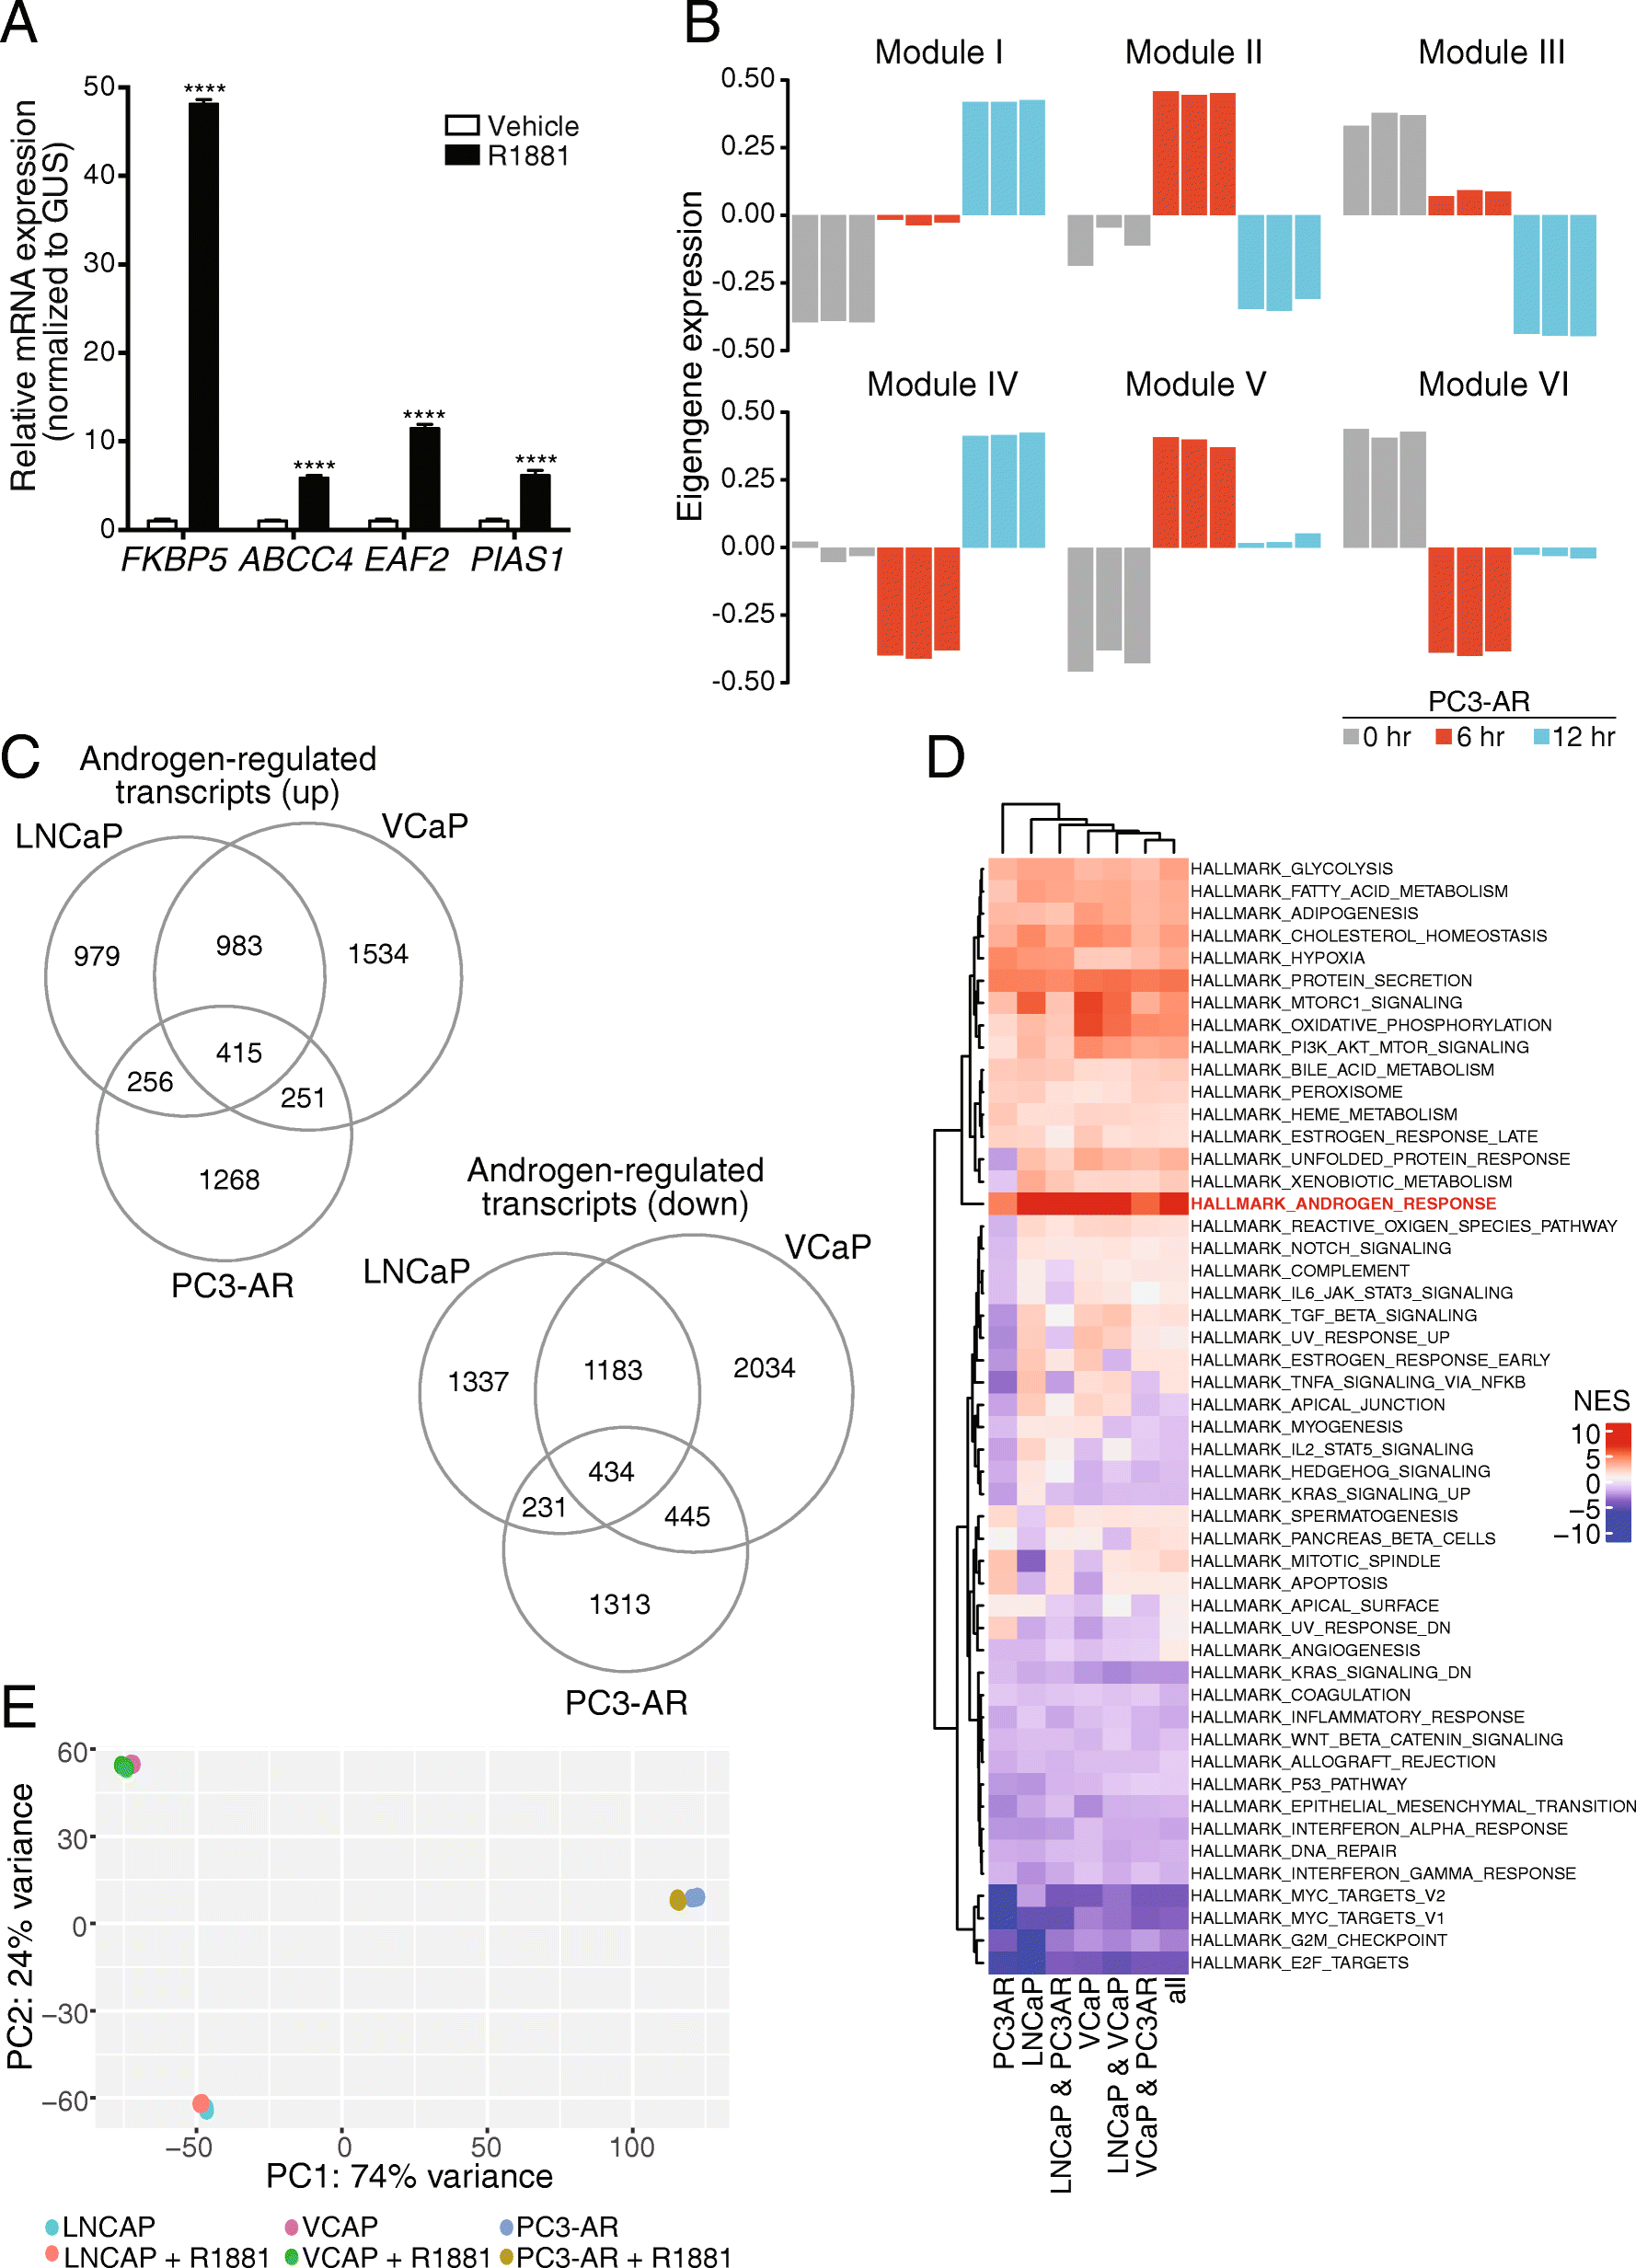 Genomic Analysis Of Dna Repair Genes And Androgen Signaling In Circuit Design Suite Screenshot 34 Fig 3